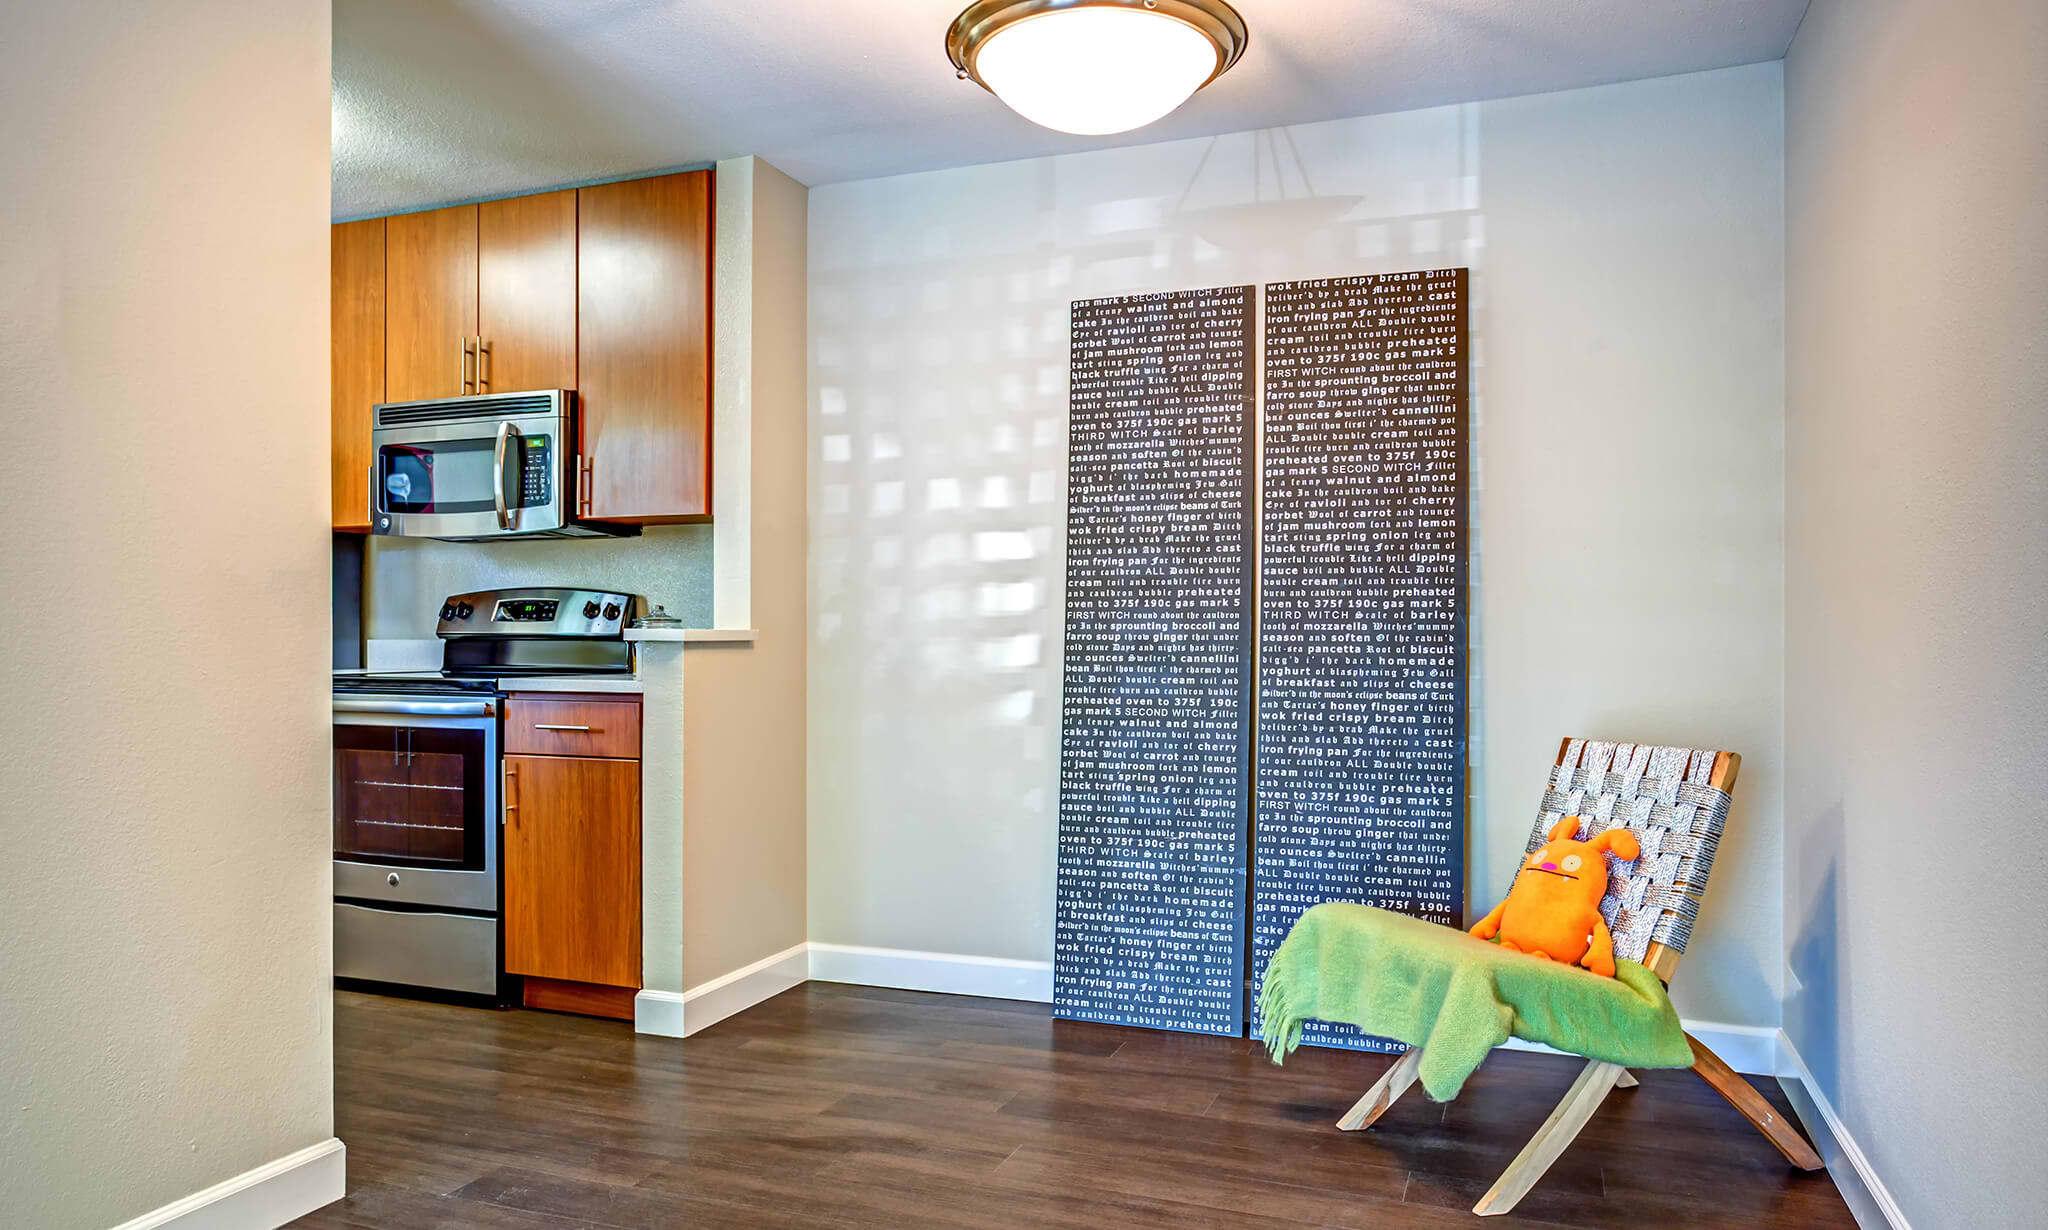 Alderwood Apartments apartments in Santa Clara CA to rent photo 7